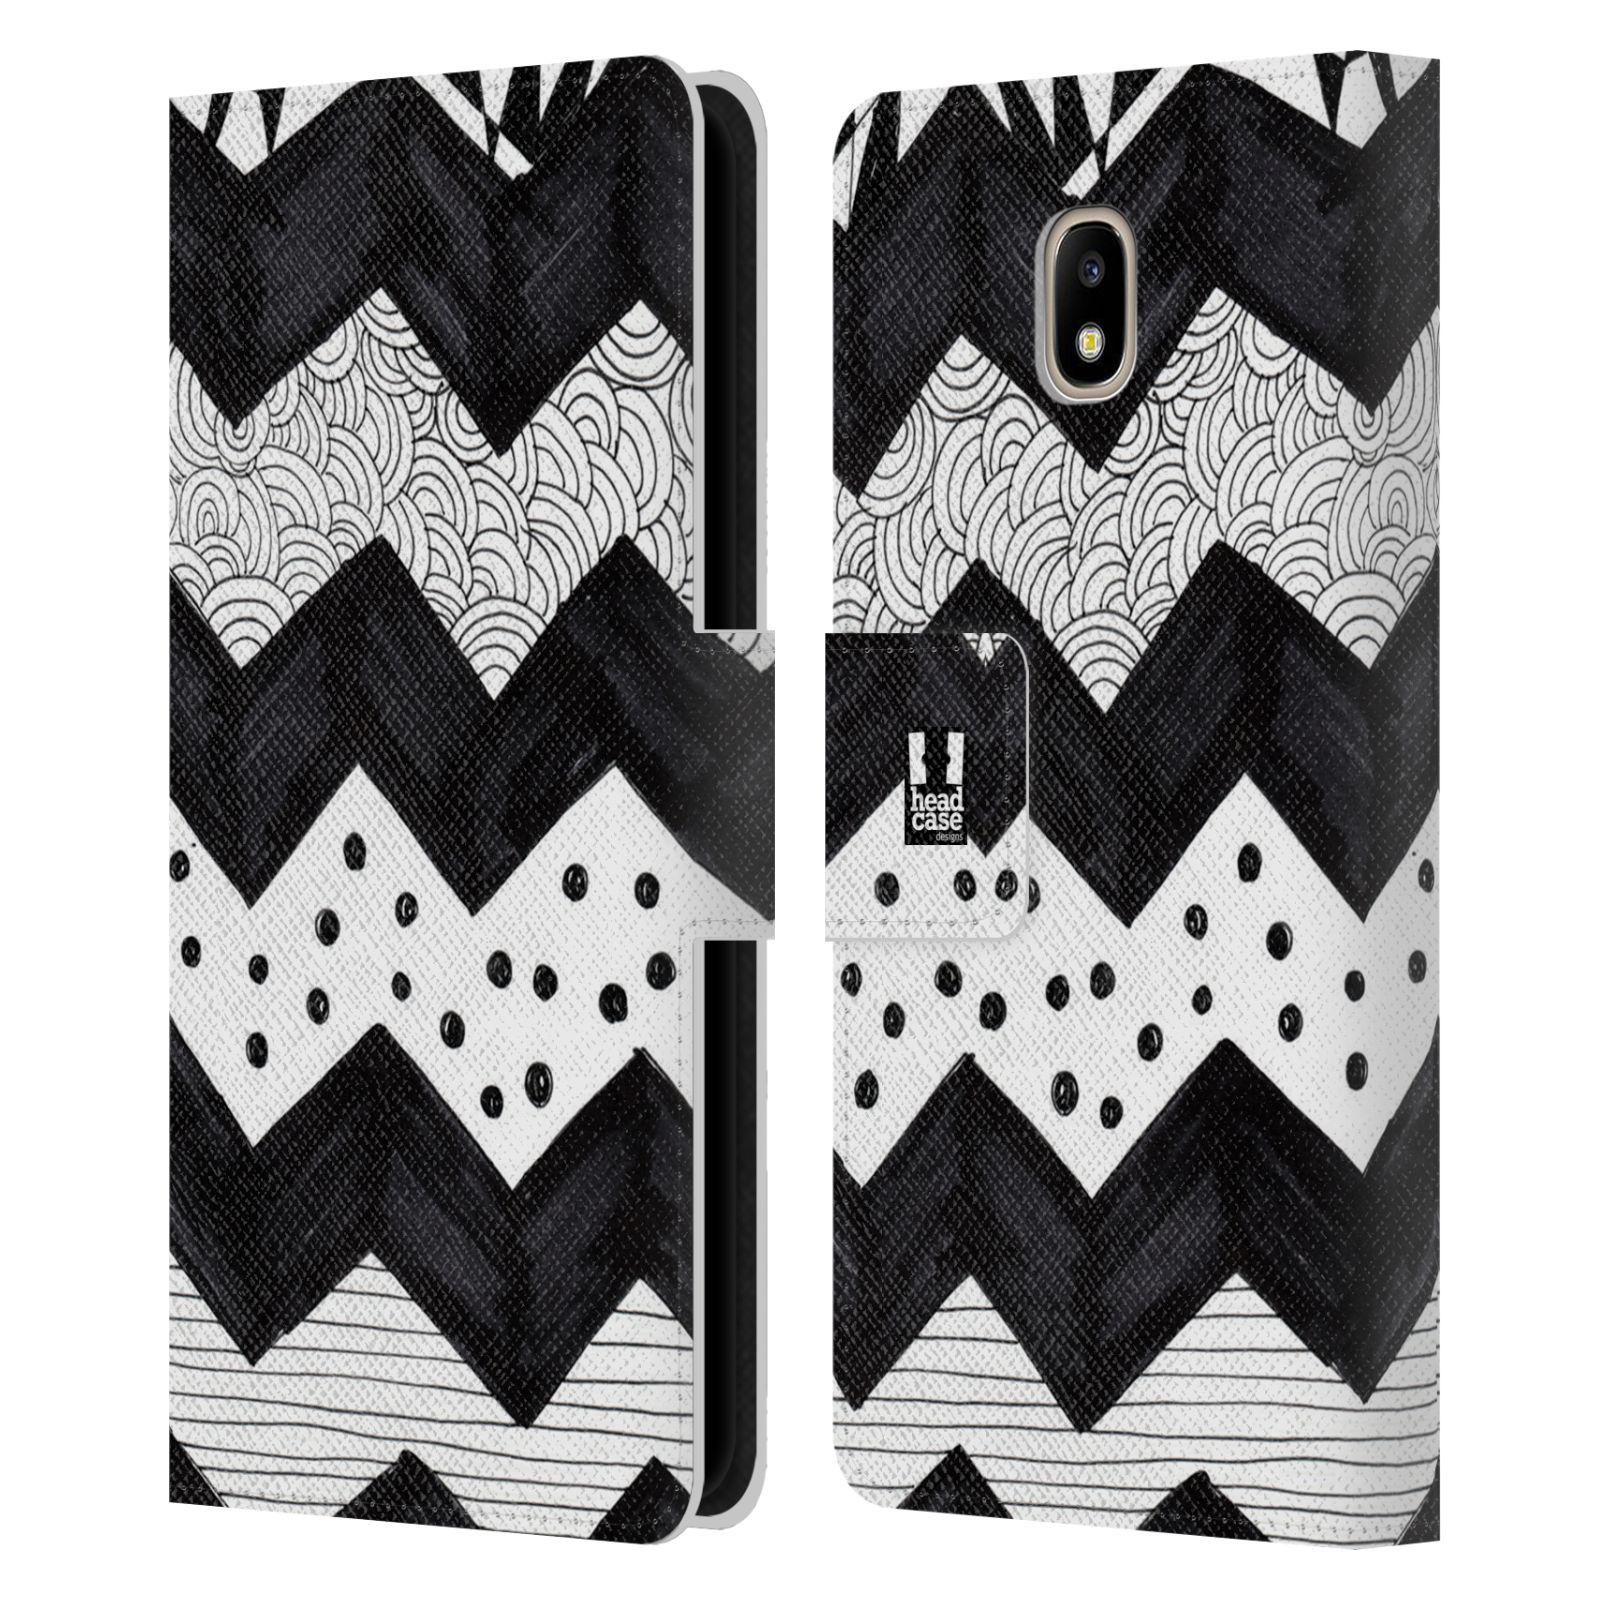 HEAD CASE Flipové pouzdro pro mobil Samsung Galaxy J5 2017 kresba a  čmáranice pruhy cik cak černá a bílá 0664c46a233